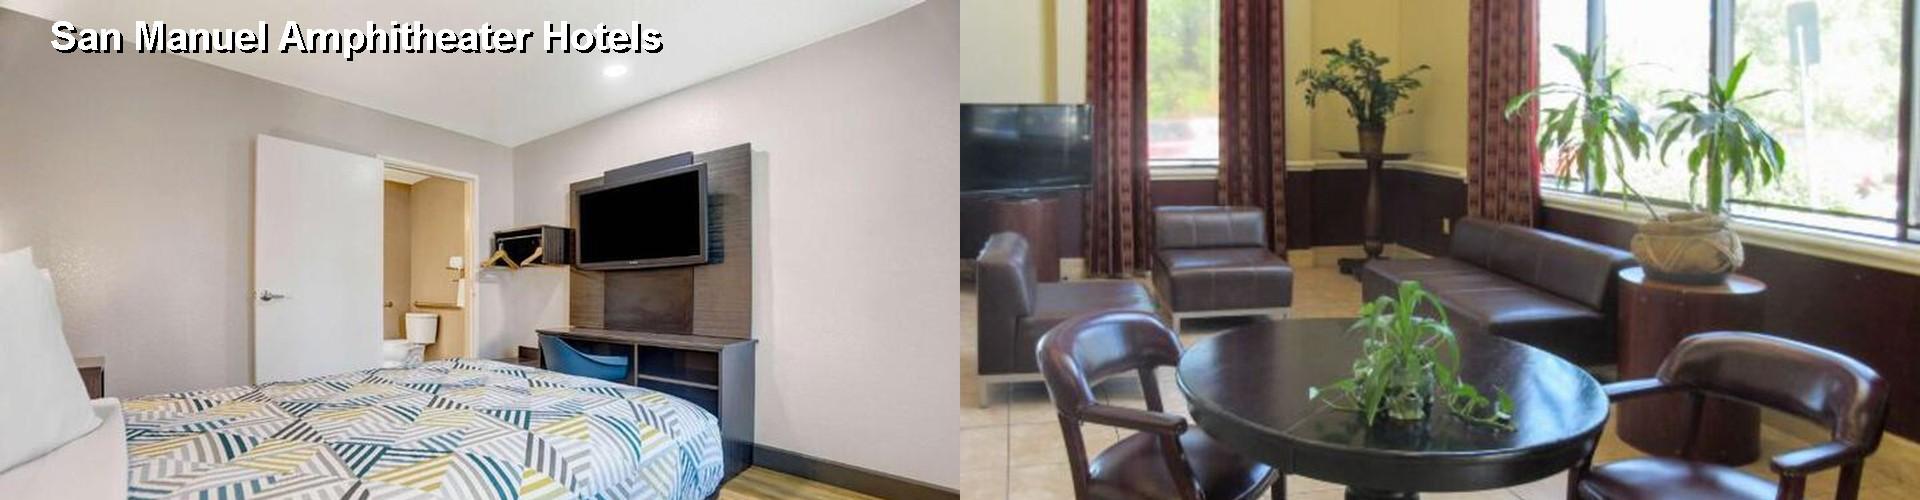 $48+ Hotels Near San Manuel Amphitheater in San Bernardino CA